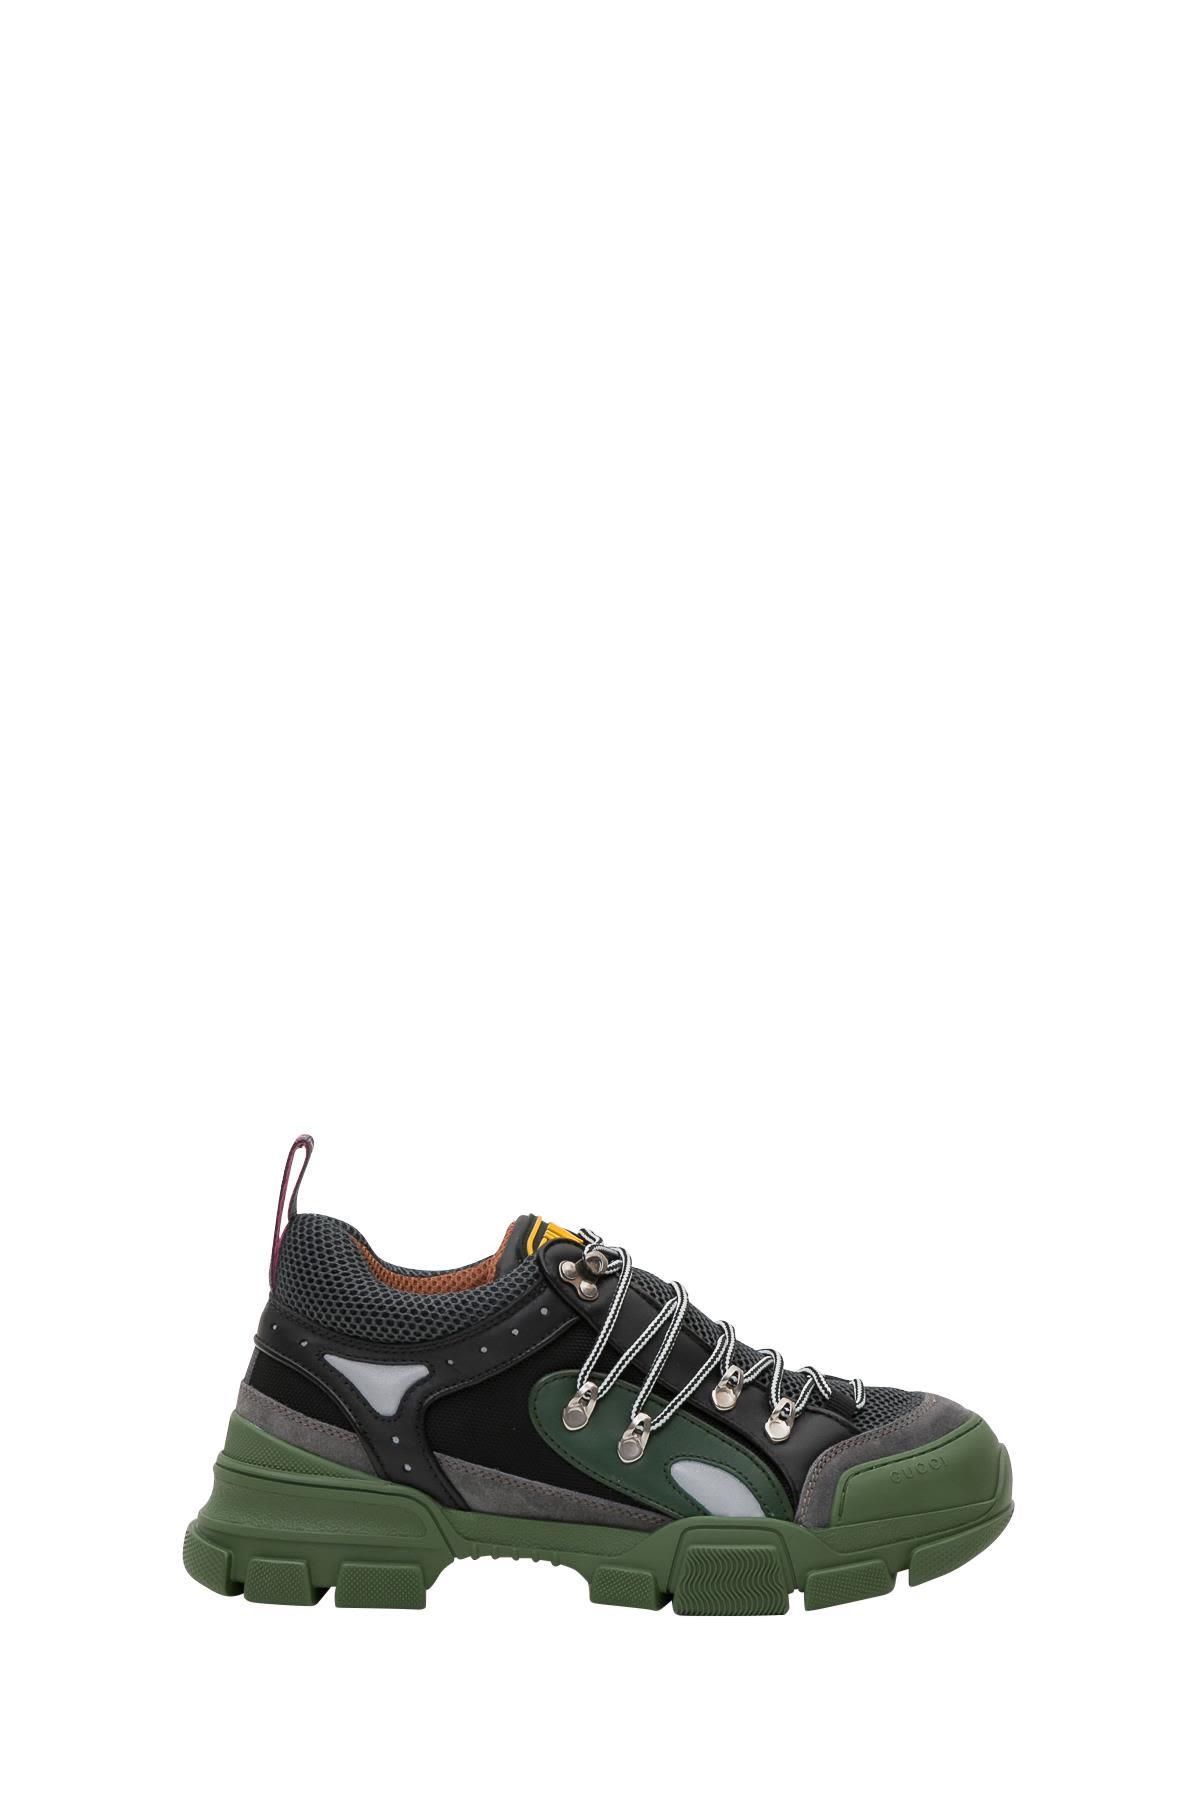 gucci -  Flashtrek Sneaker